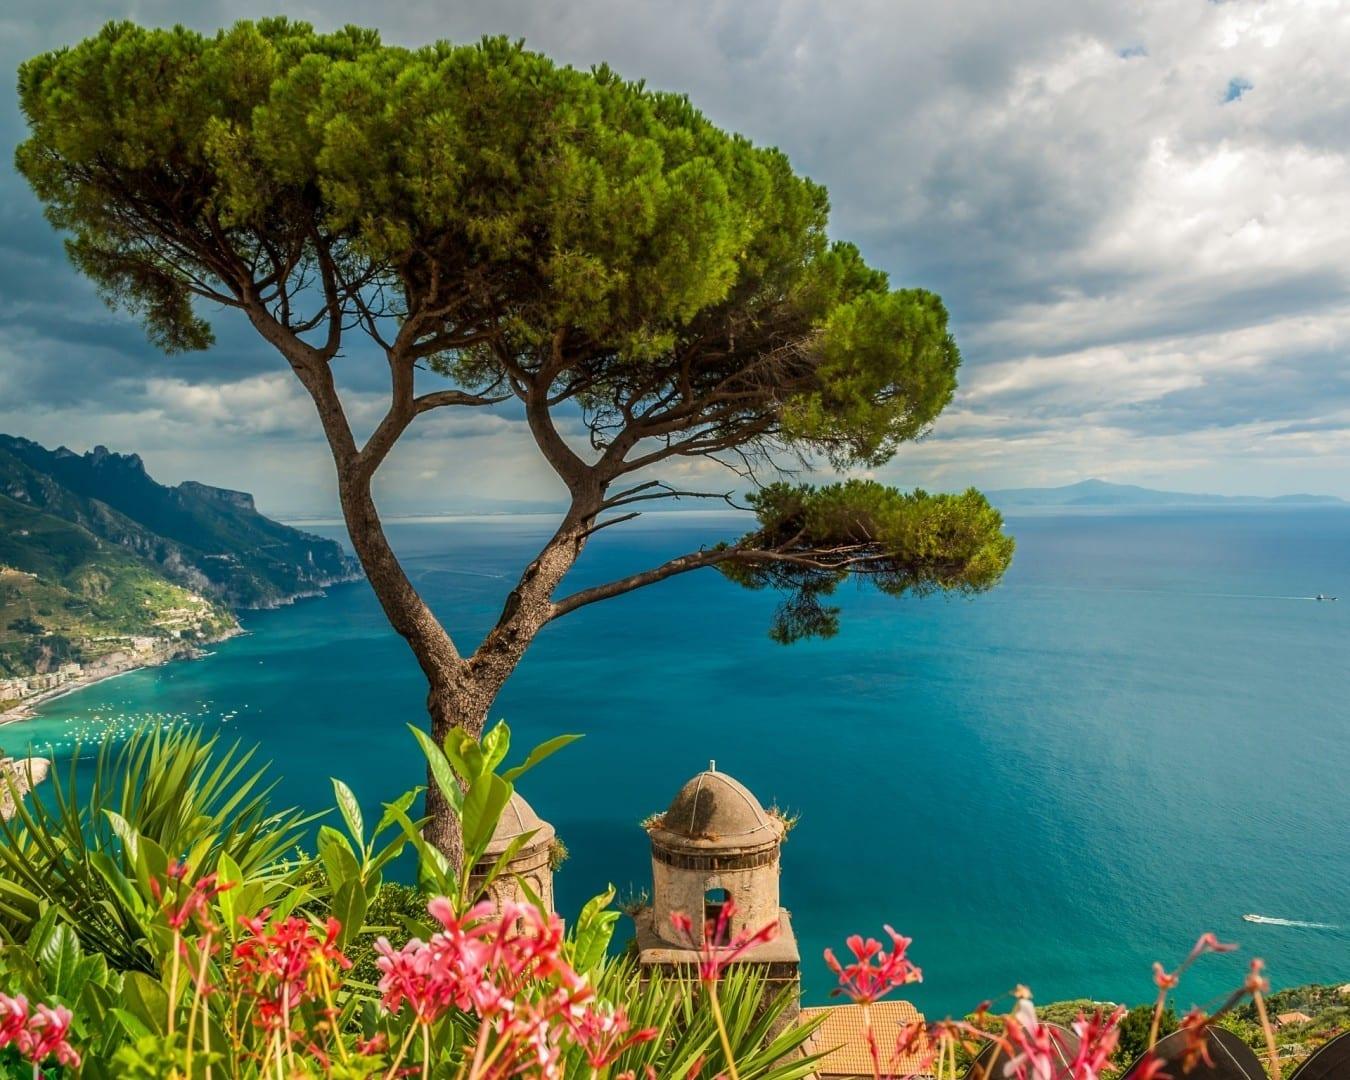 Vista desde los jardines de Villa Rufolo Ravello Italia